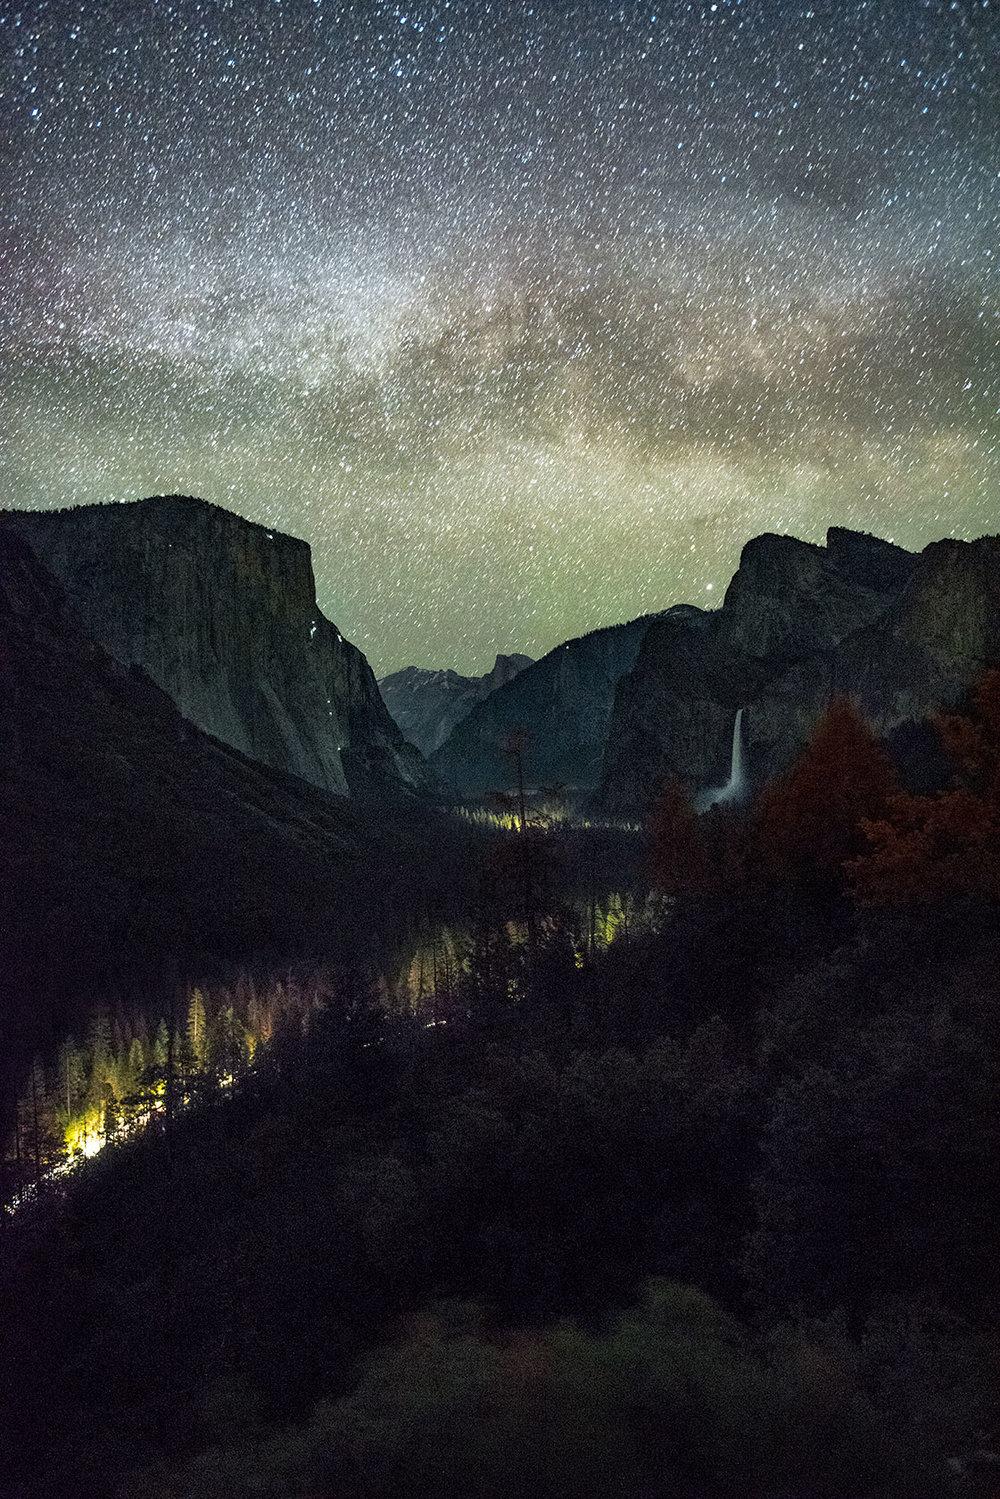 austin-trigg-yosemite-national-park-Valley-View-Night-long-exposure-milky-way-stars-california-adventure.jpg